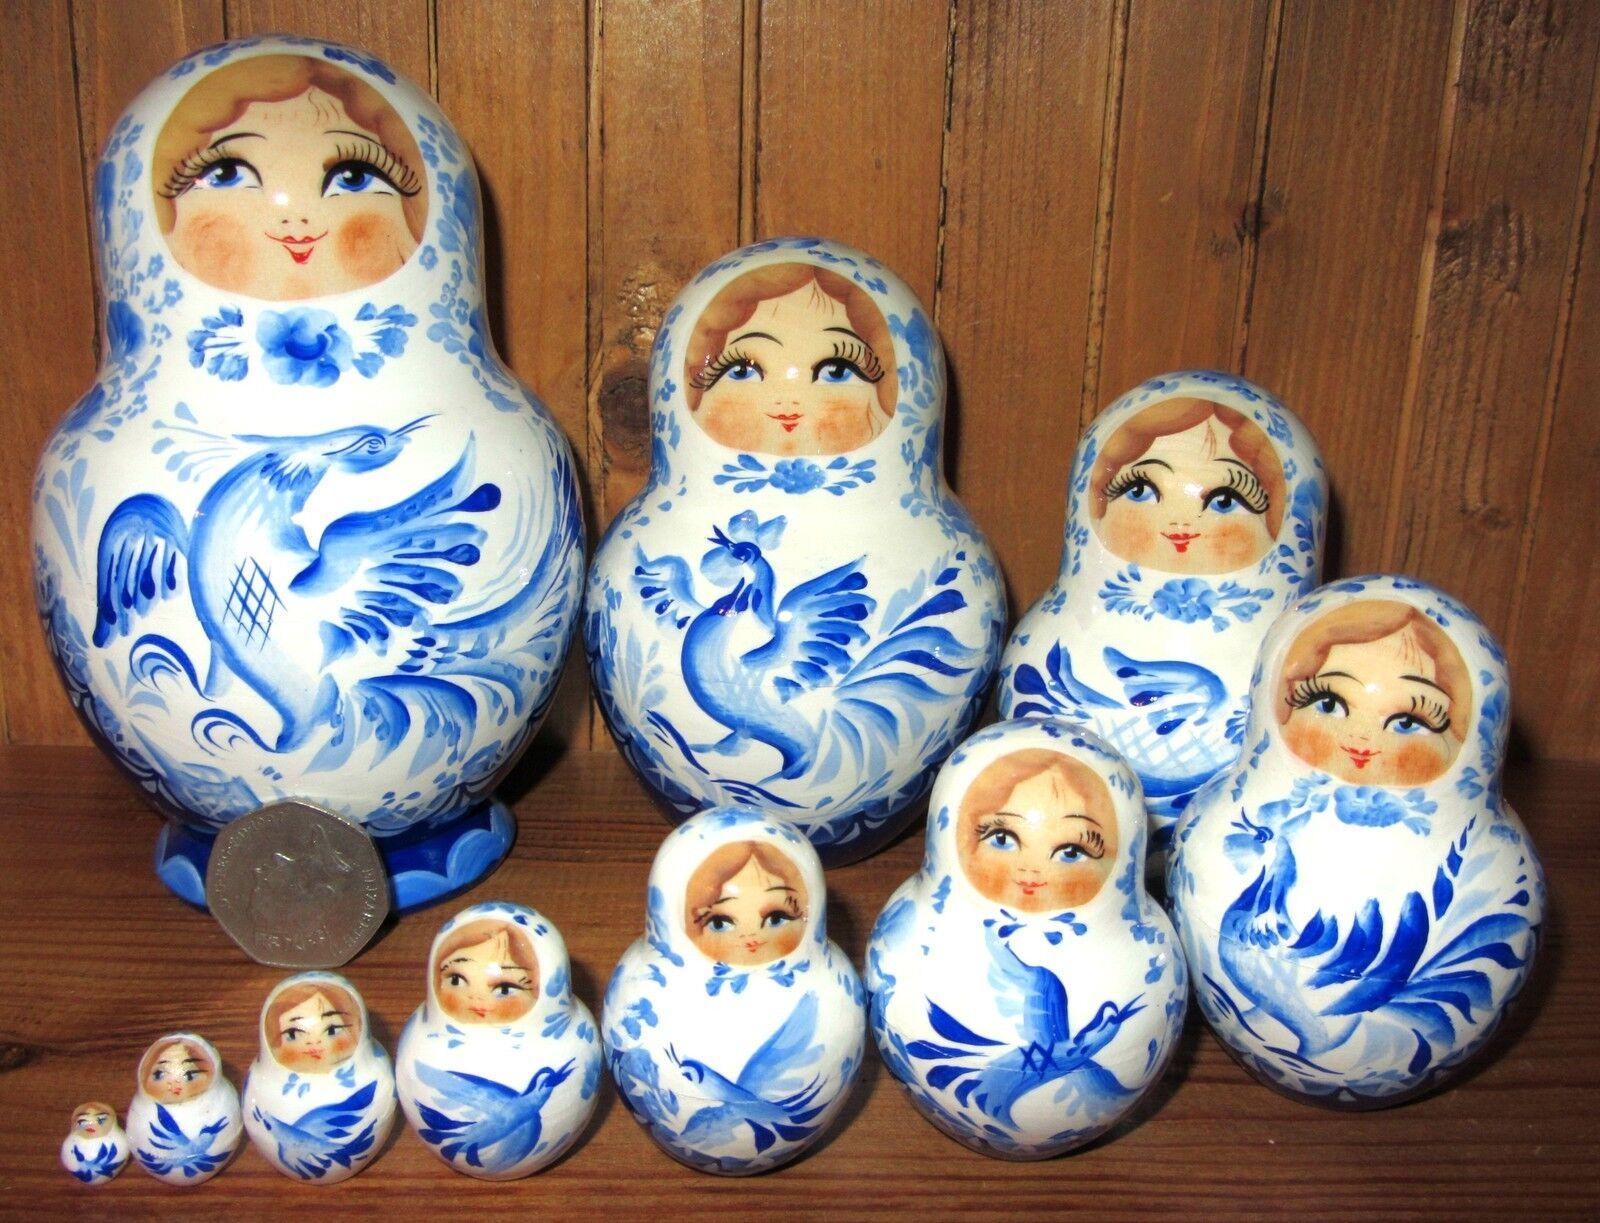 Nesting Russian dolls Matryoshka Babushka 10 Weiß Blau birds MARCHENKO Genuine